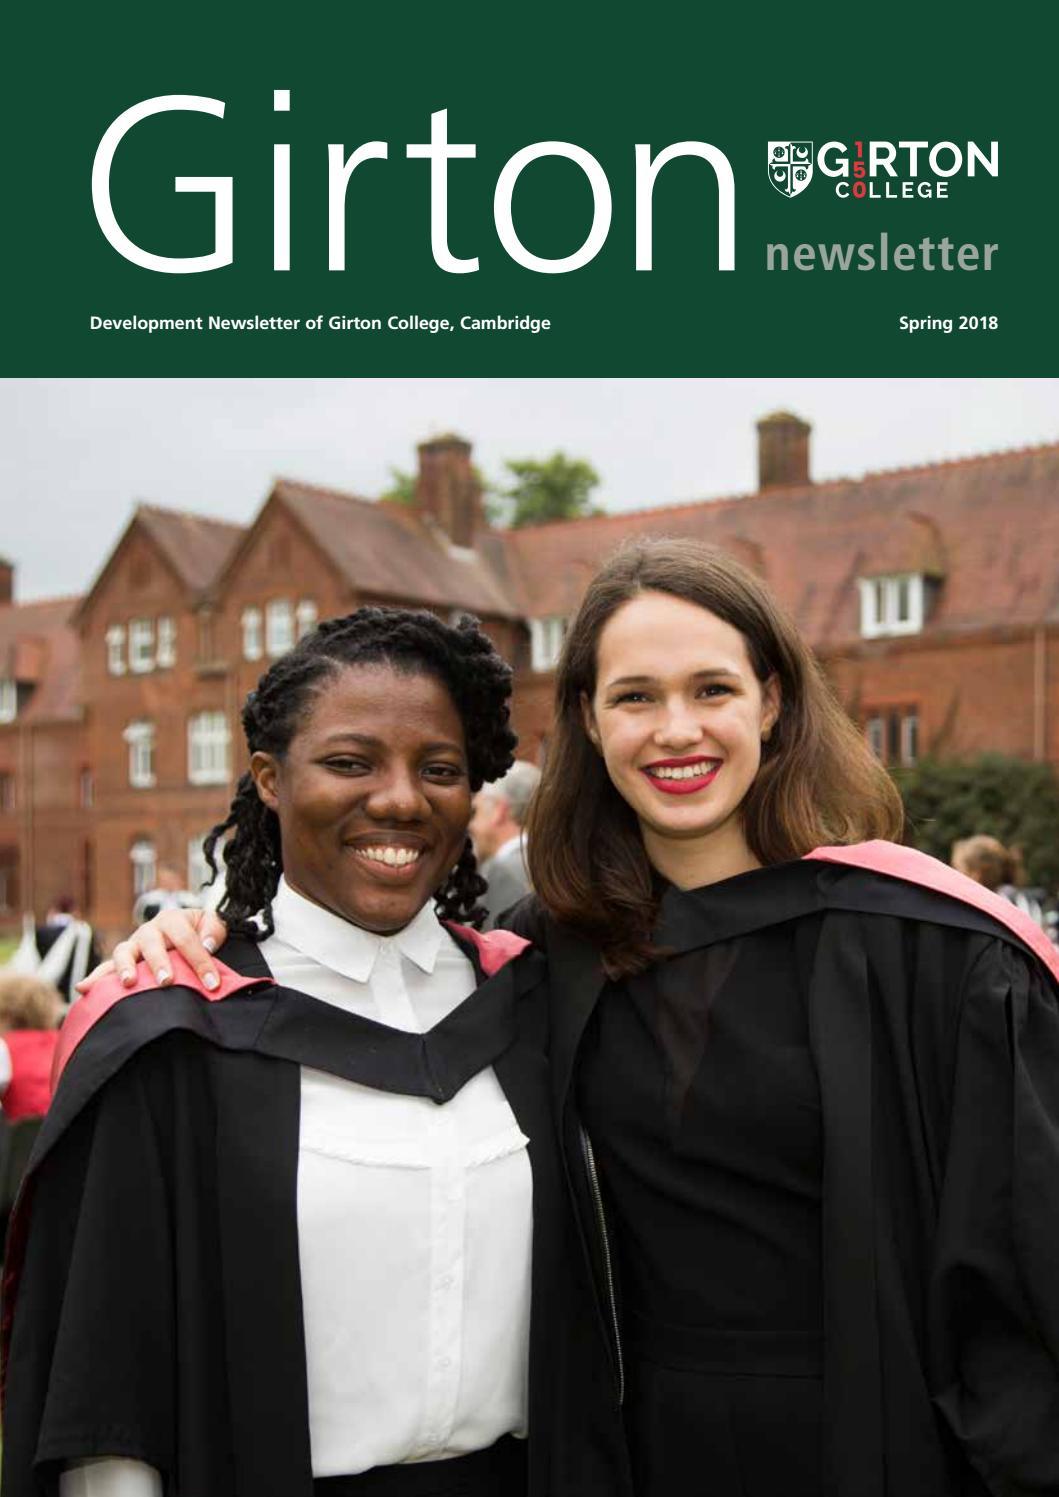 Girton College Newsletter 2018 by Girton College - issuu